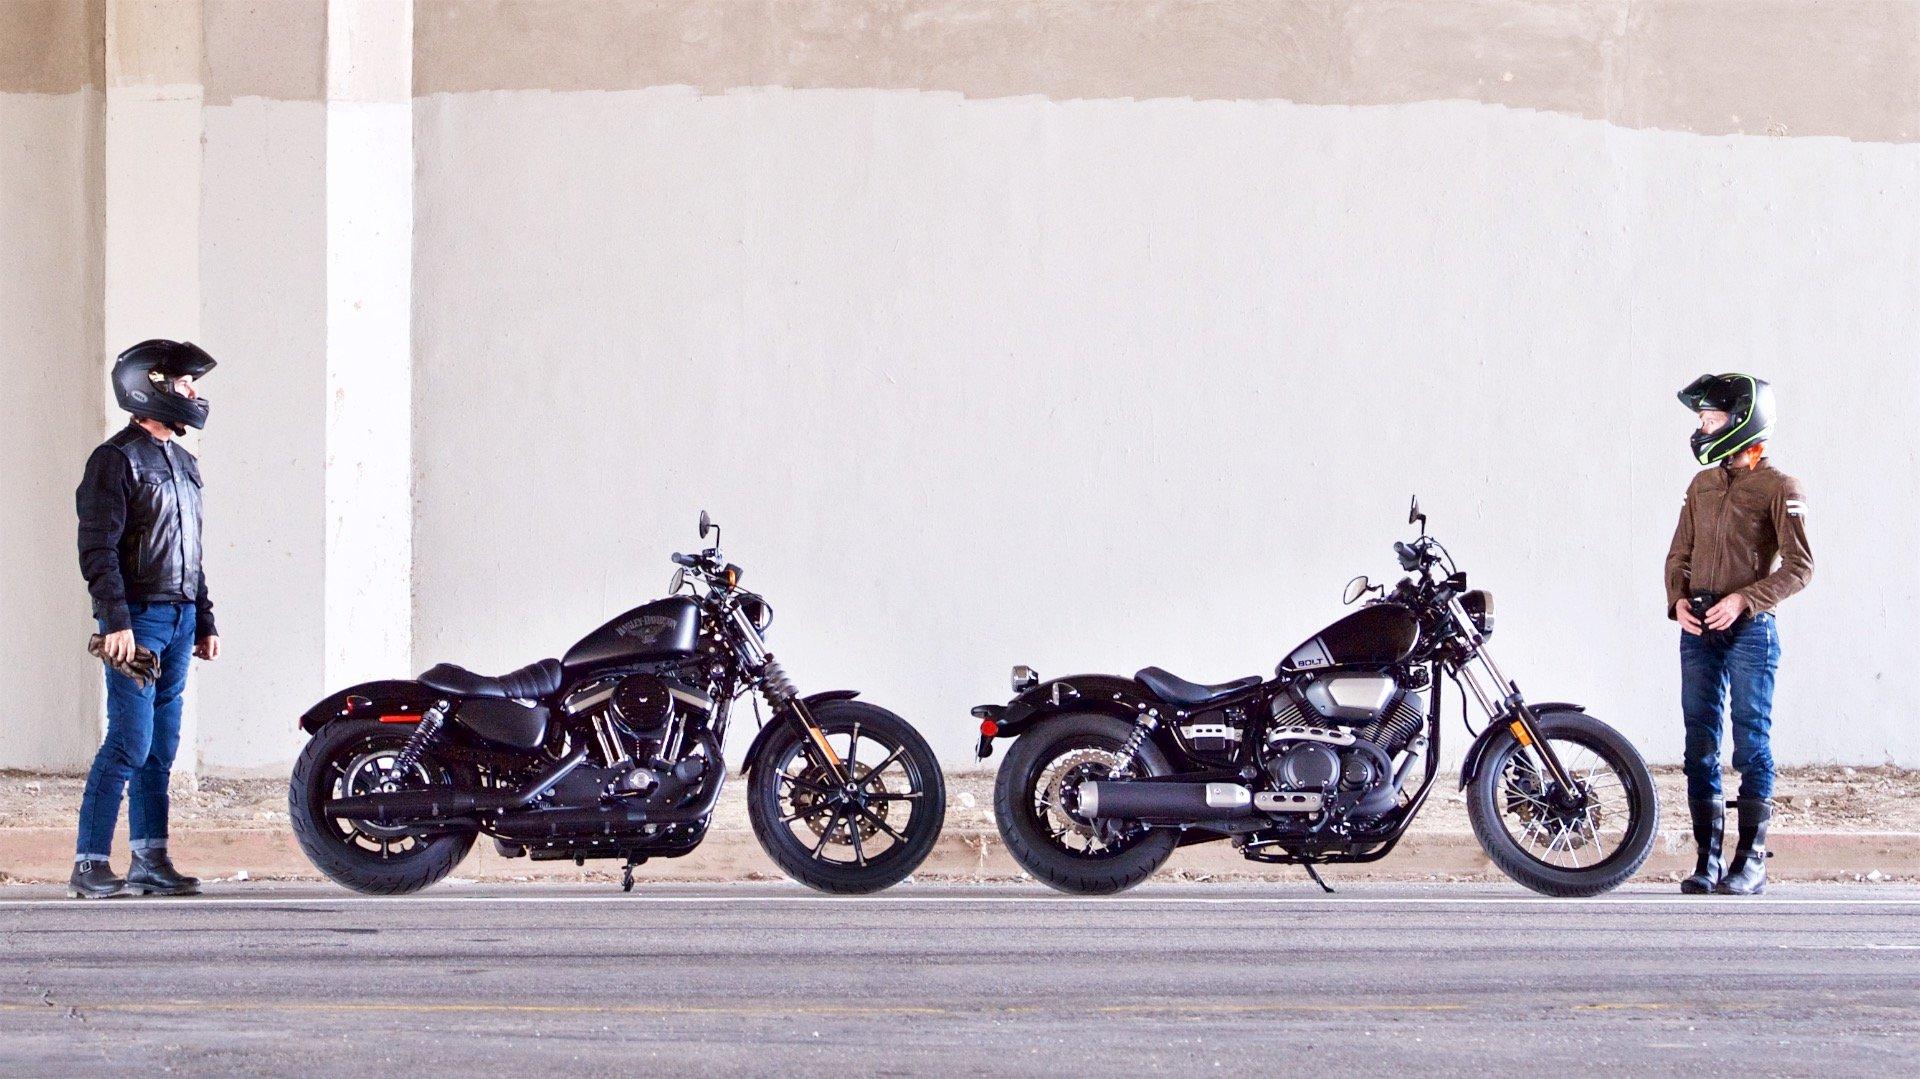 2017 Harley-Davidson Sportster Iron 883 vs. Yamaha Star Bolt